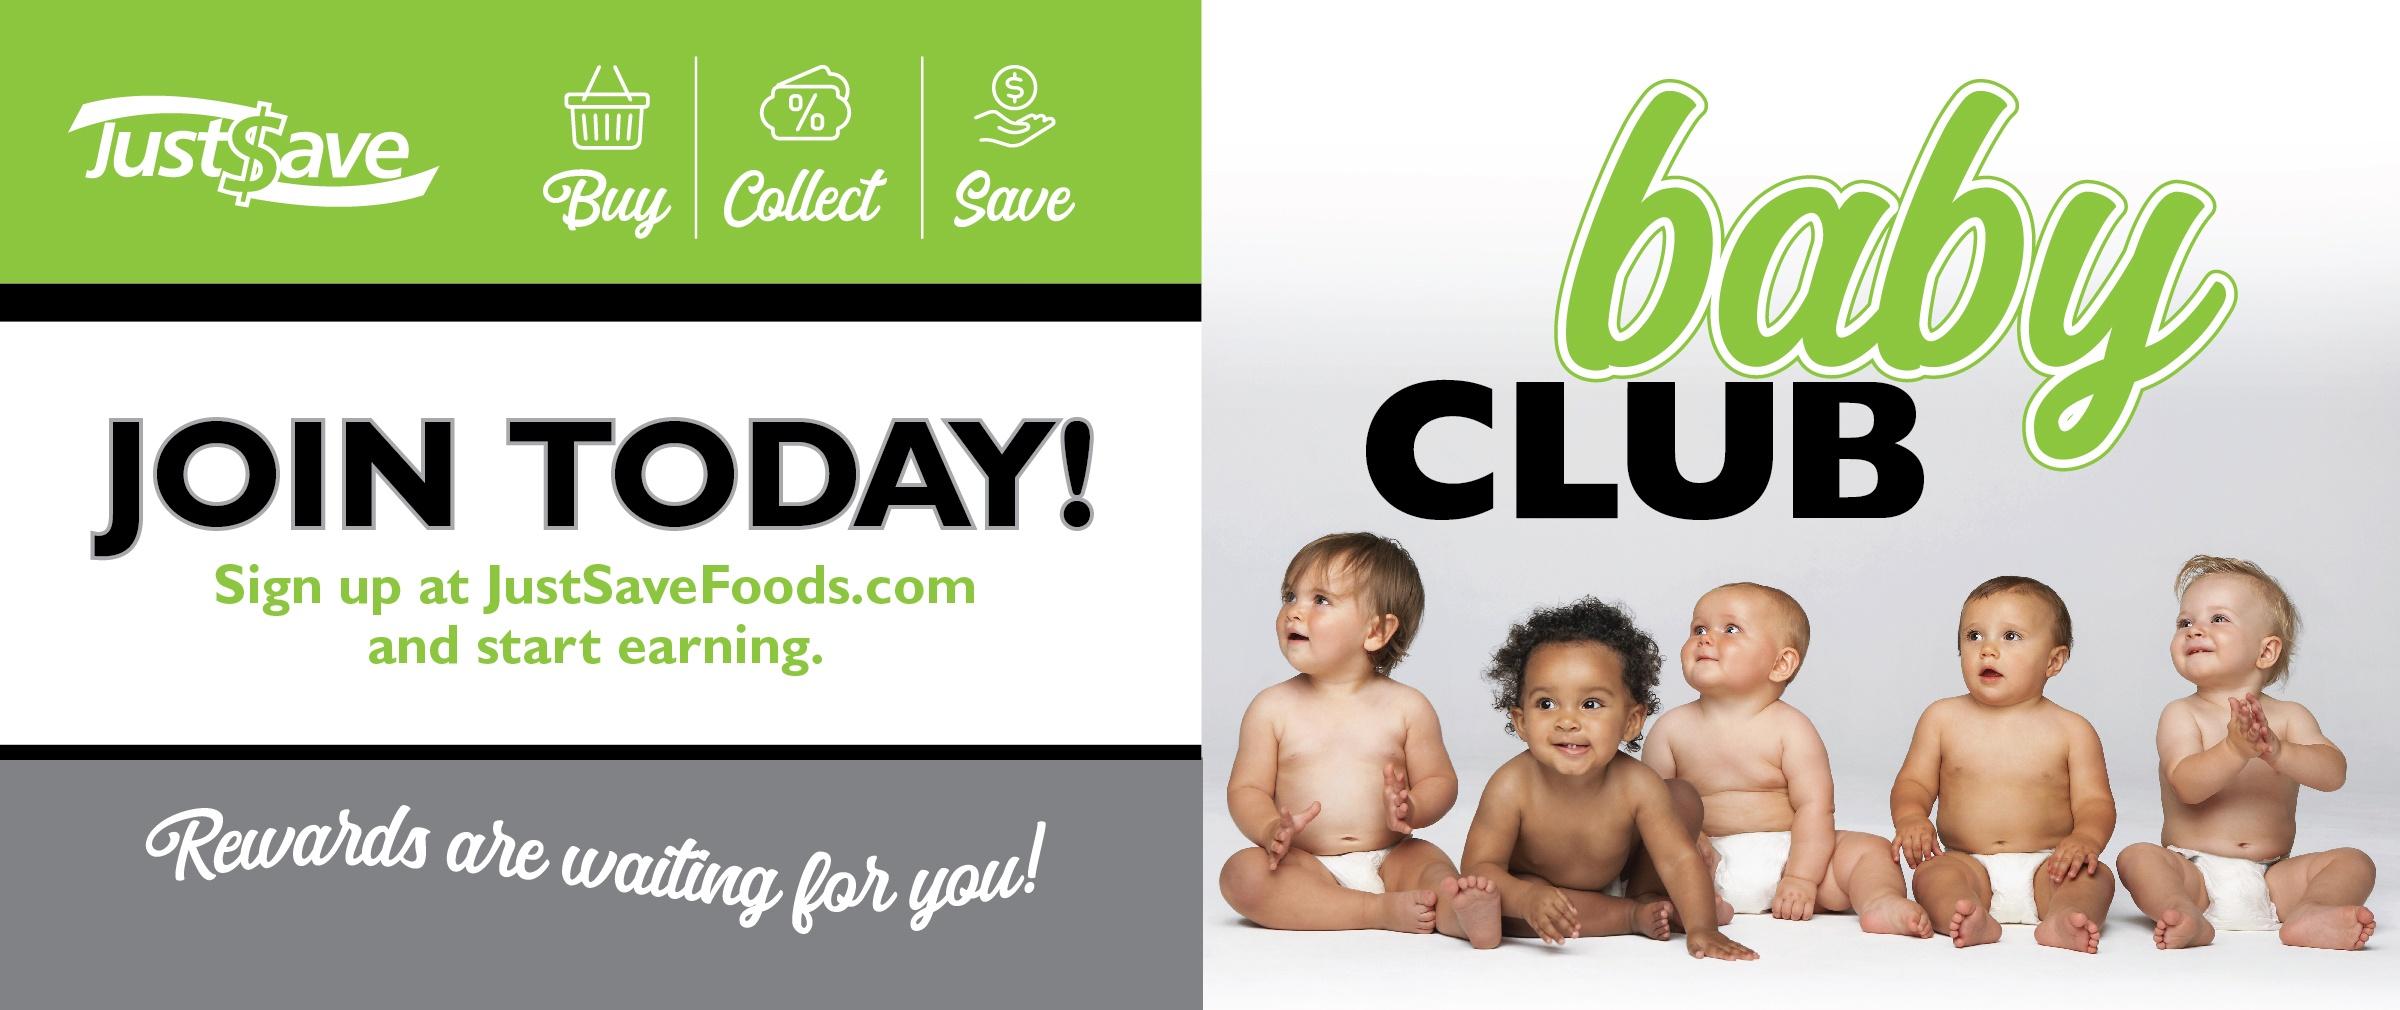 2400x1010_Gliders_BabyClub